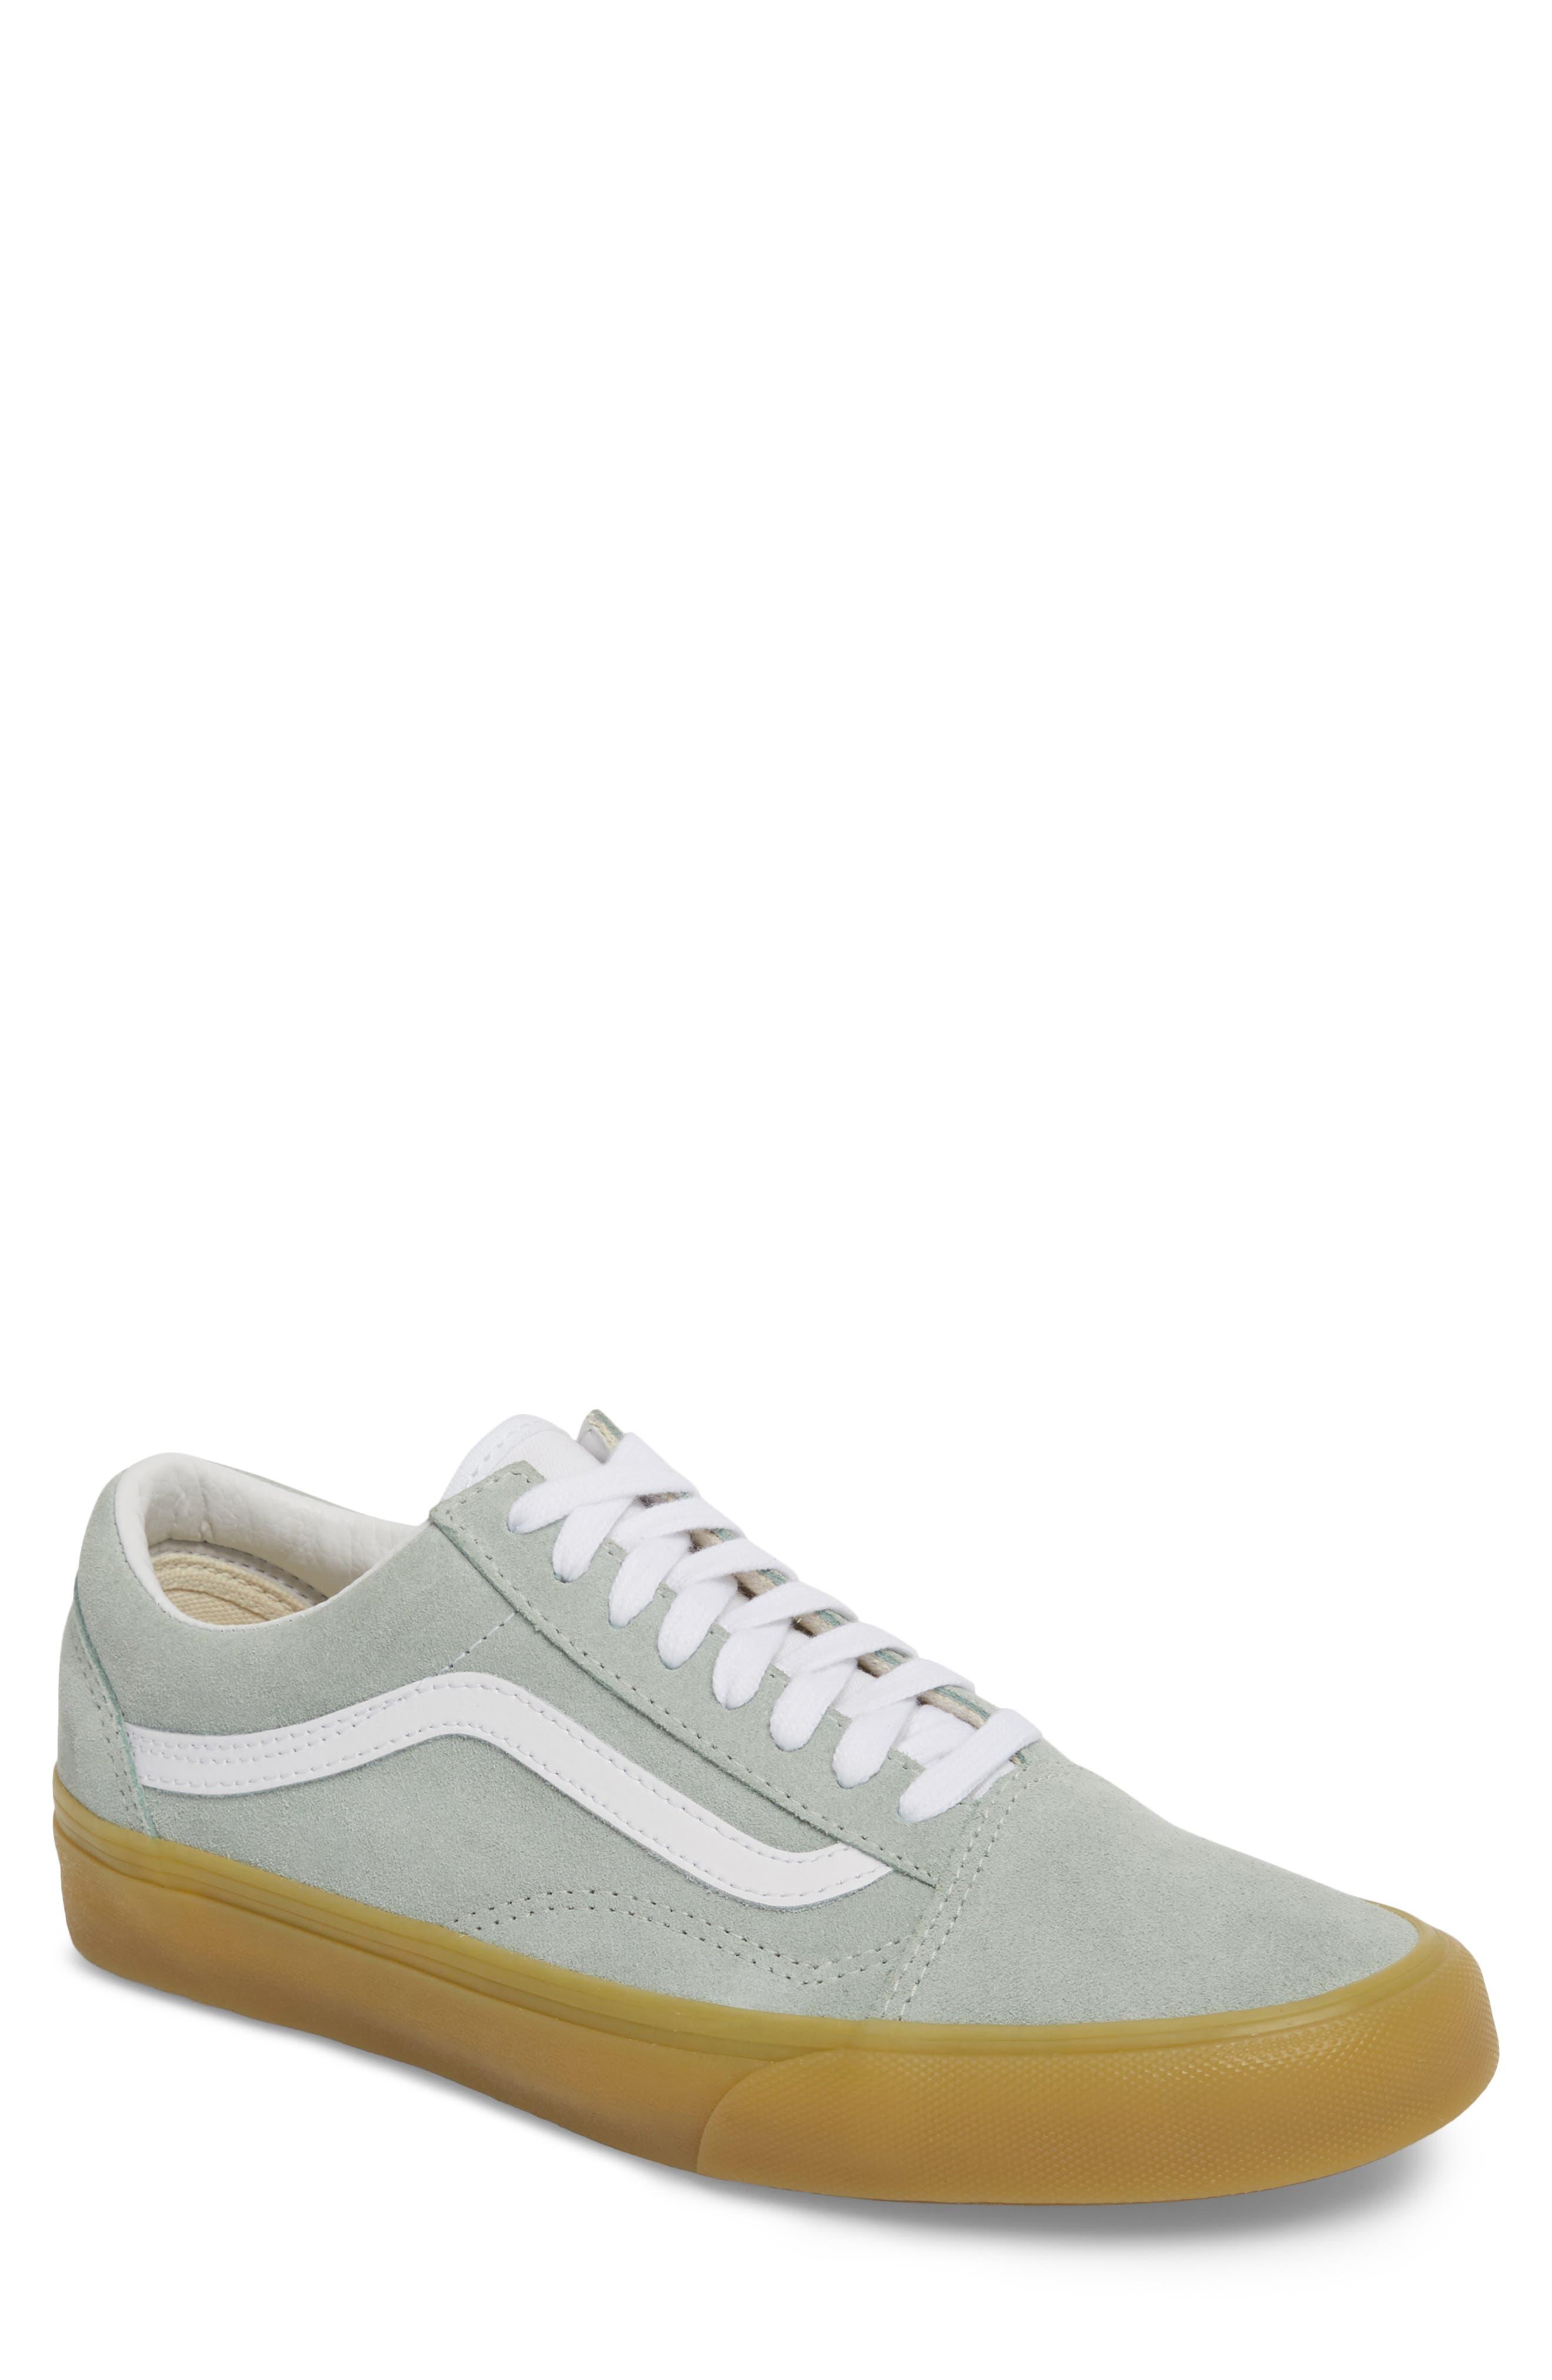 Gum Old Skool Sneaker,                             Main thumbnail 1, color,                             Metal Leather